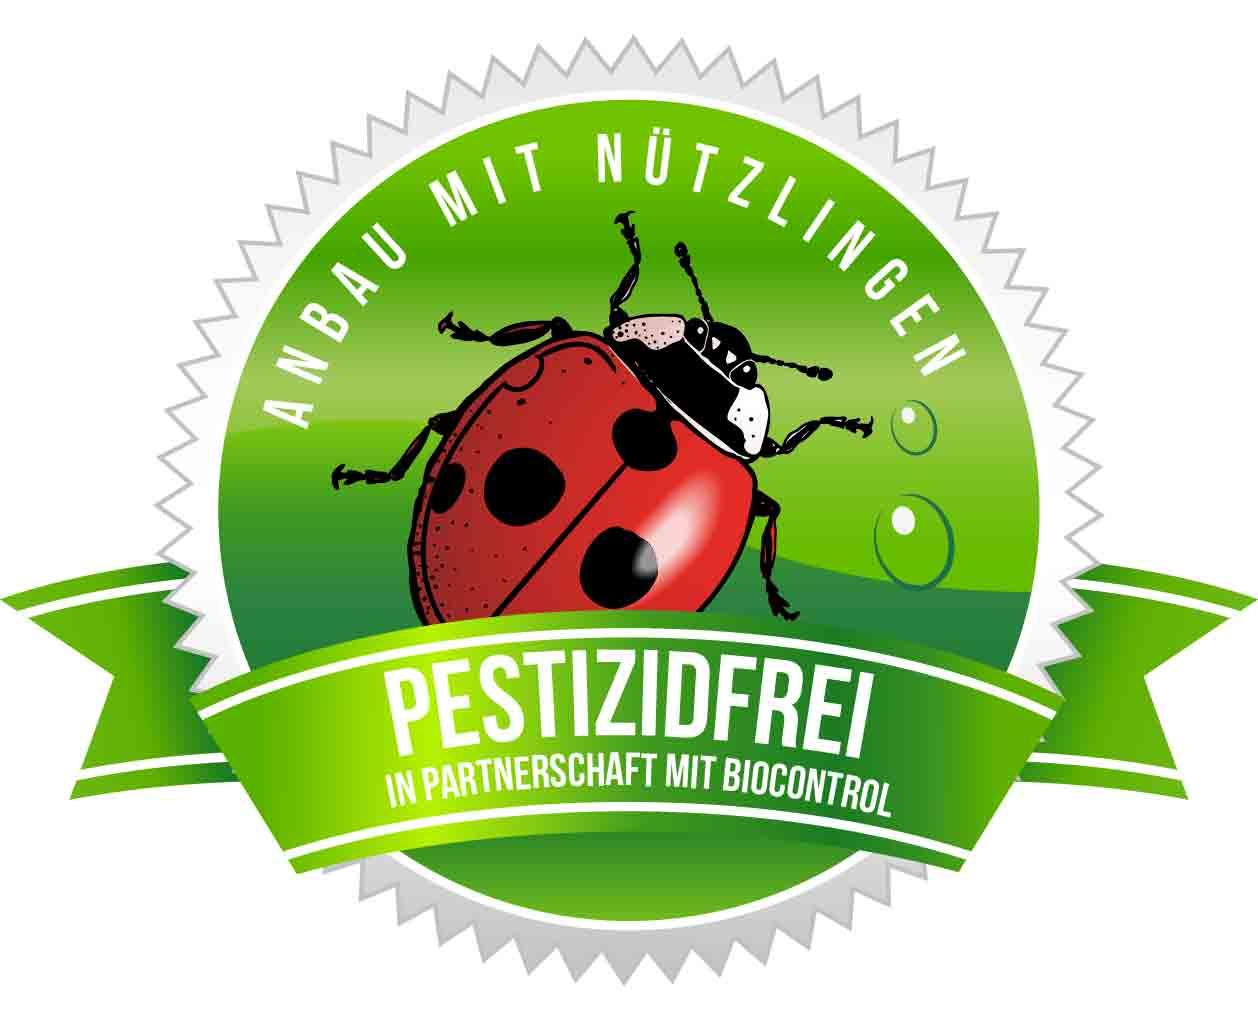 Pestizidfrei Biocontrol